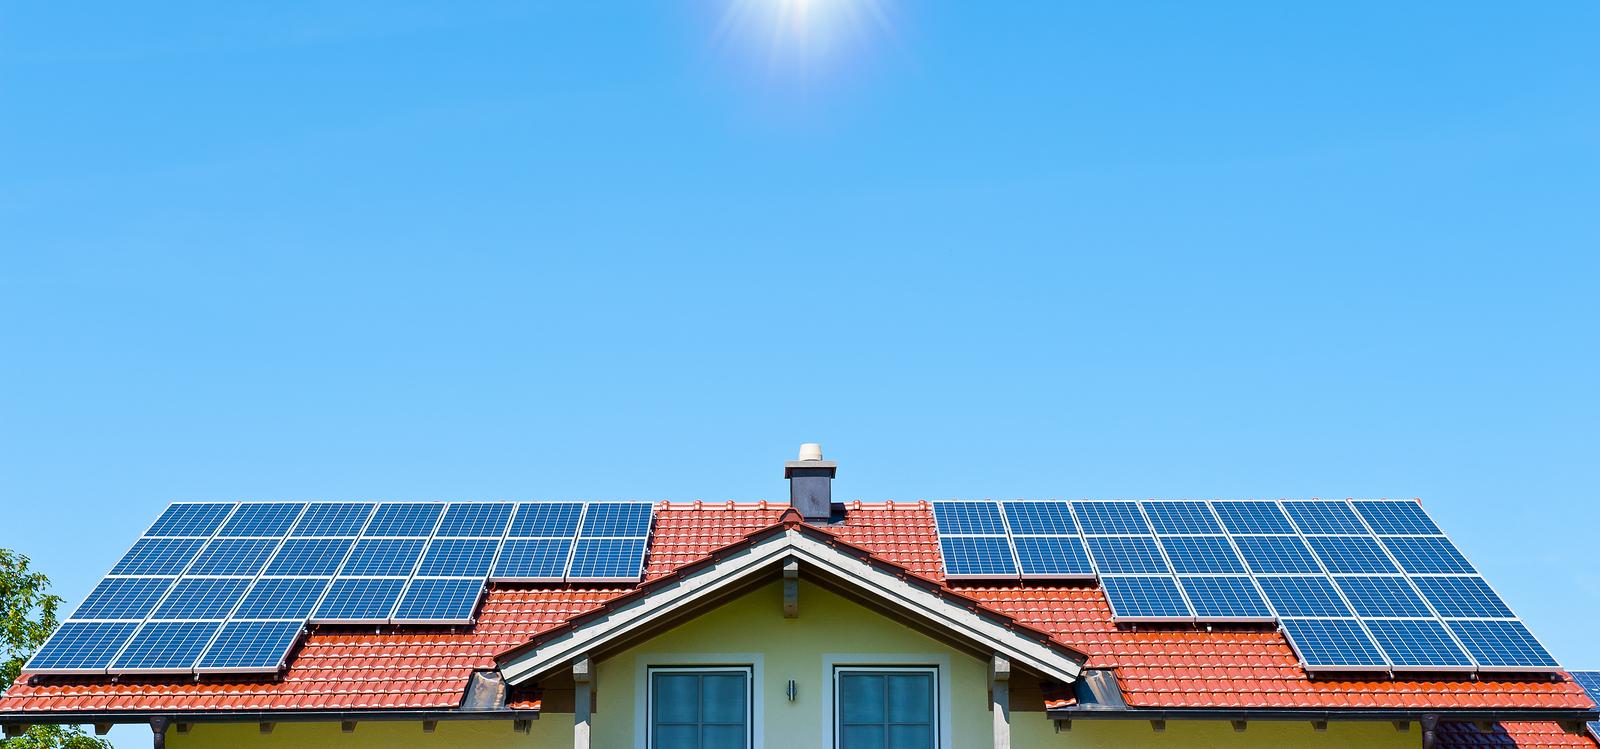 Photovoltaik Solarmoduke